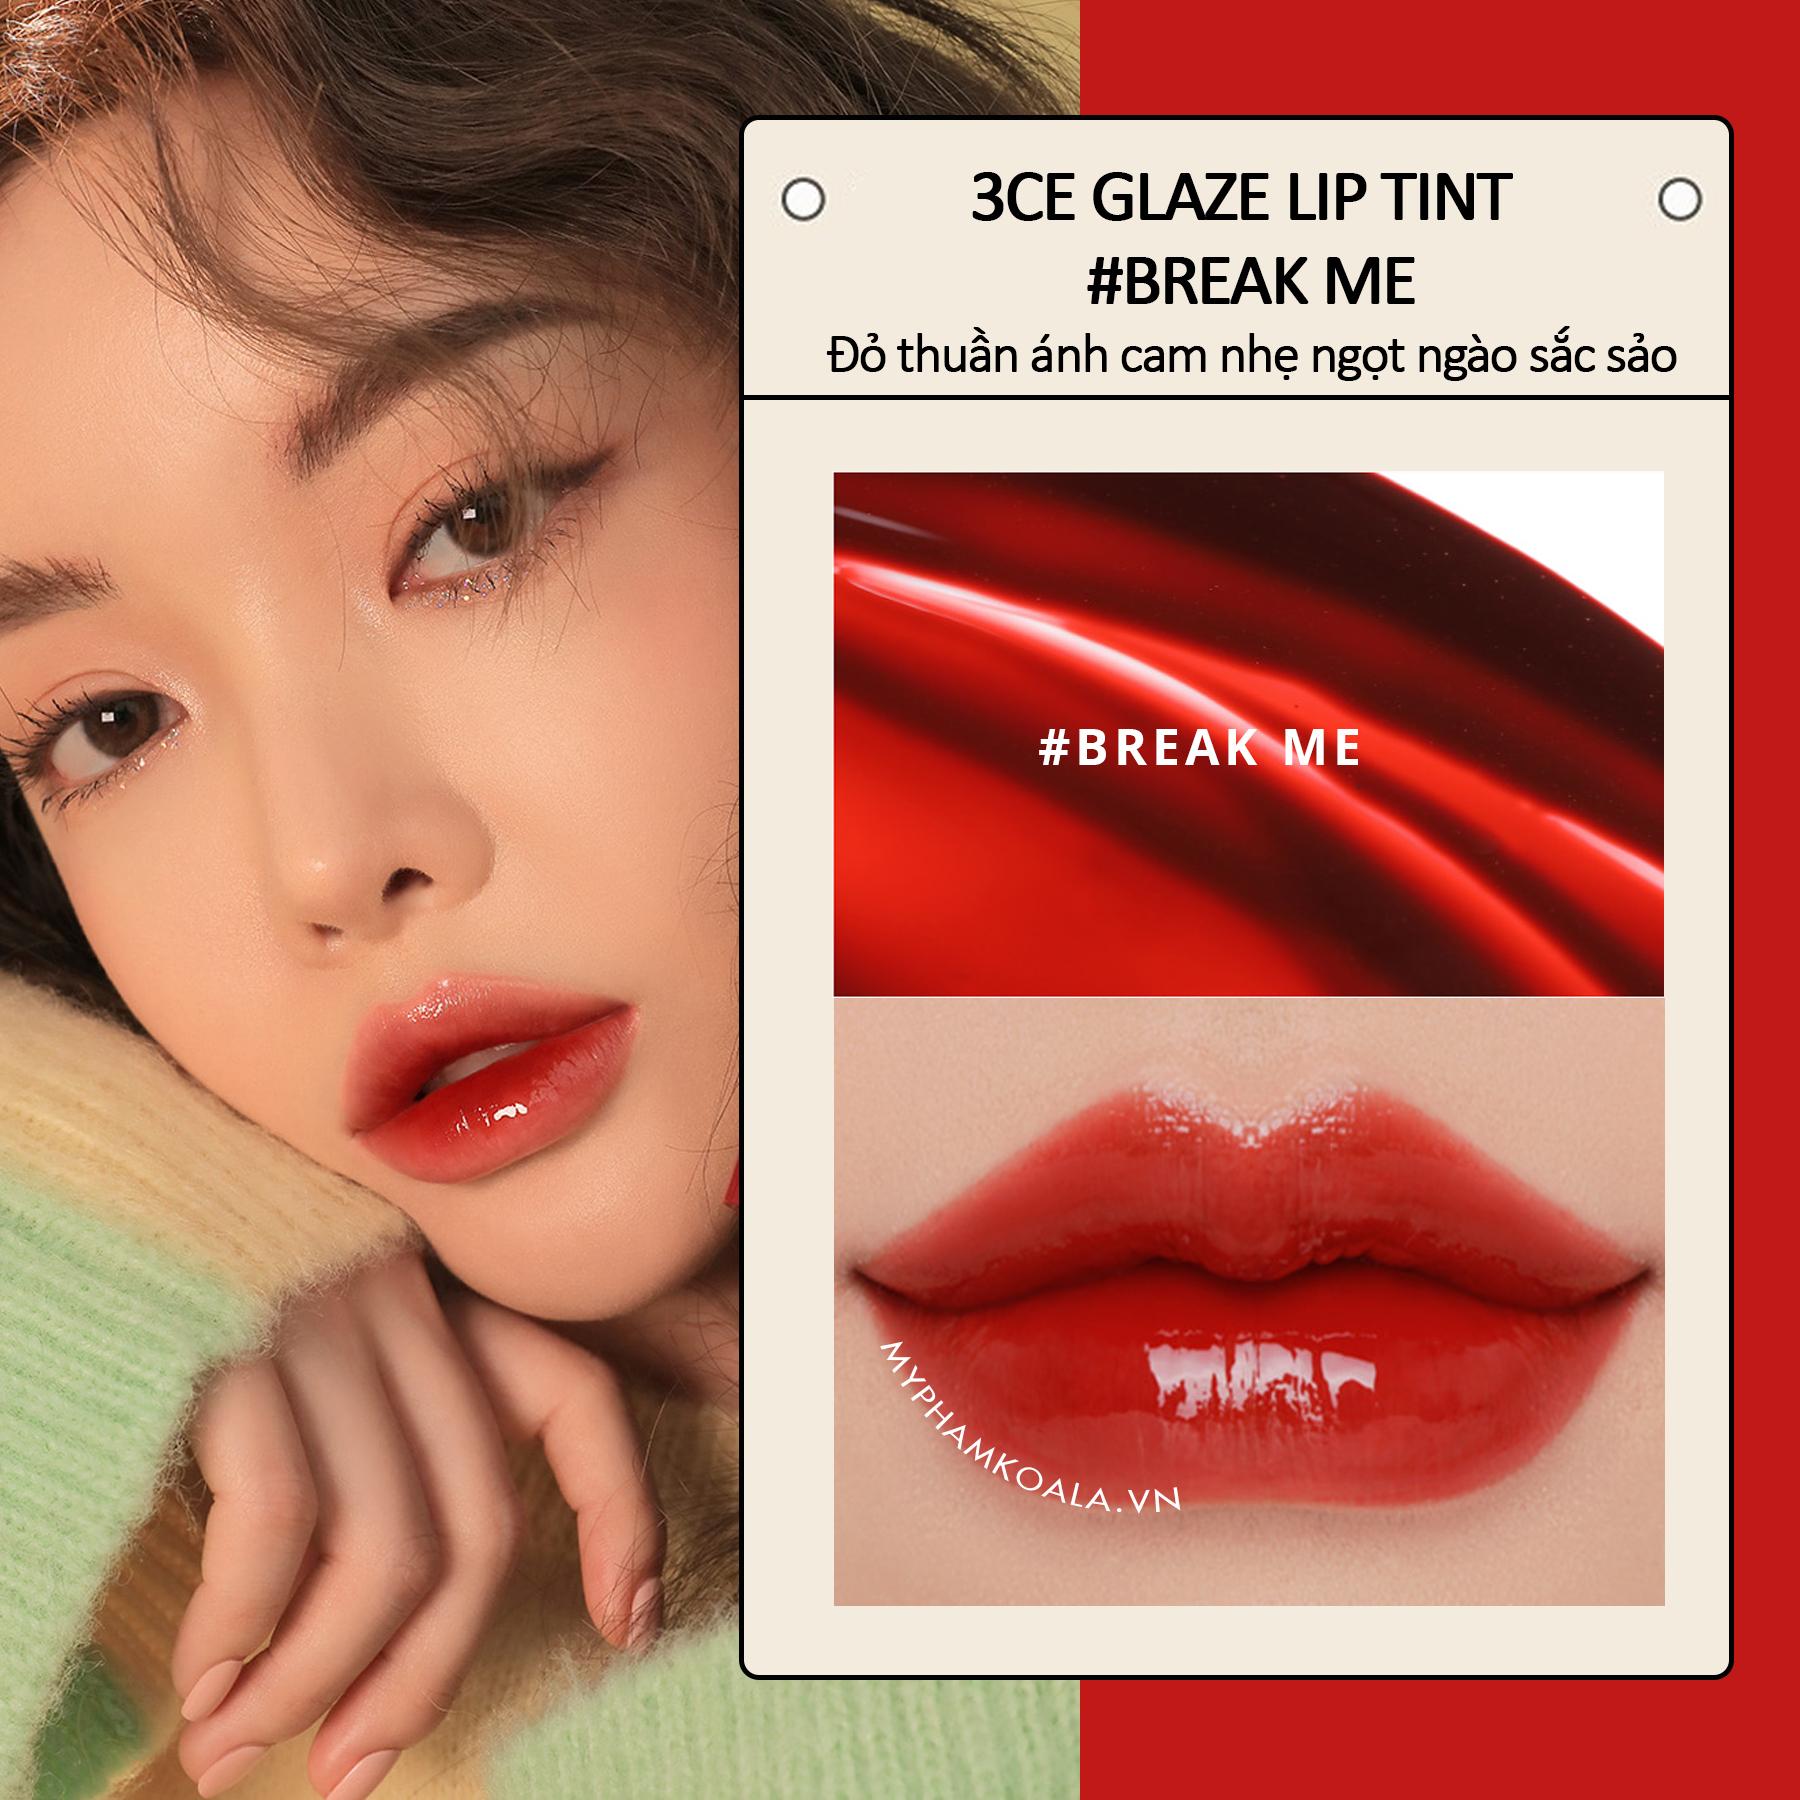 Son Tint Lì 3CE Glaze Lip Tint